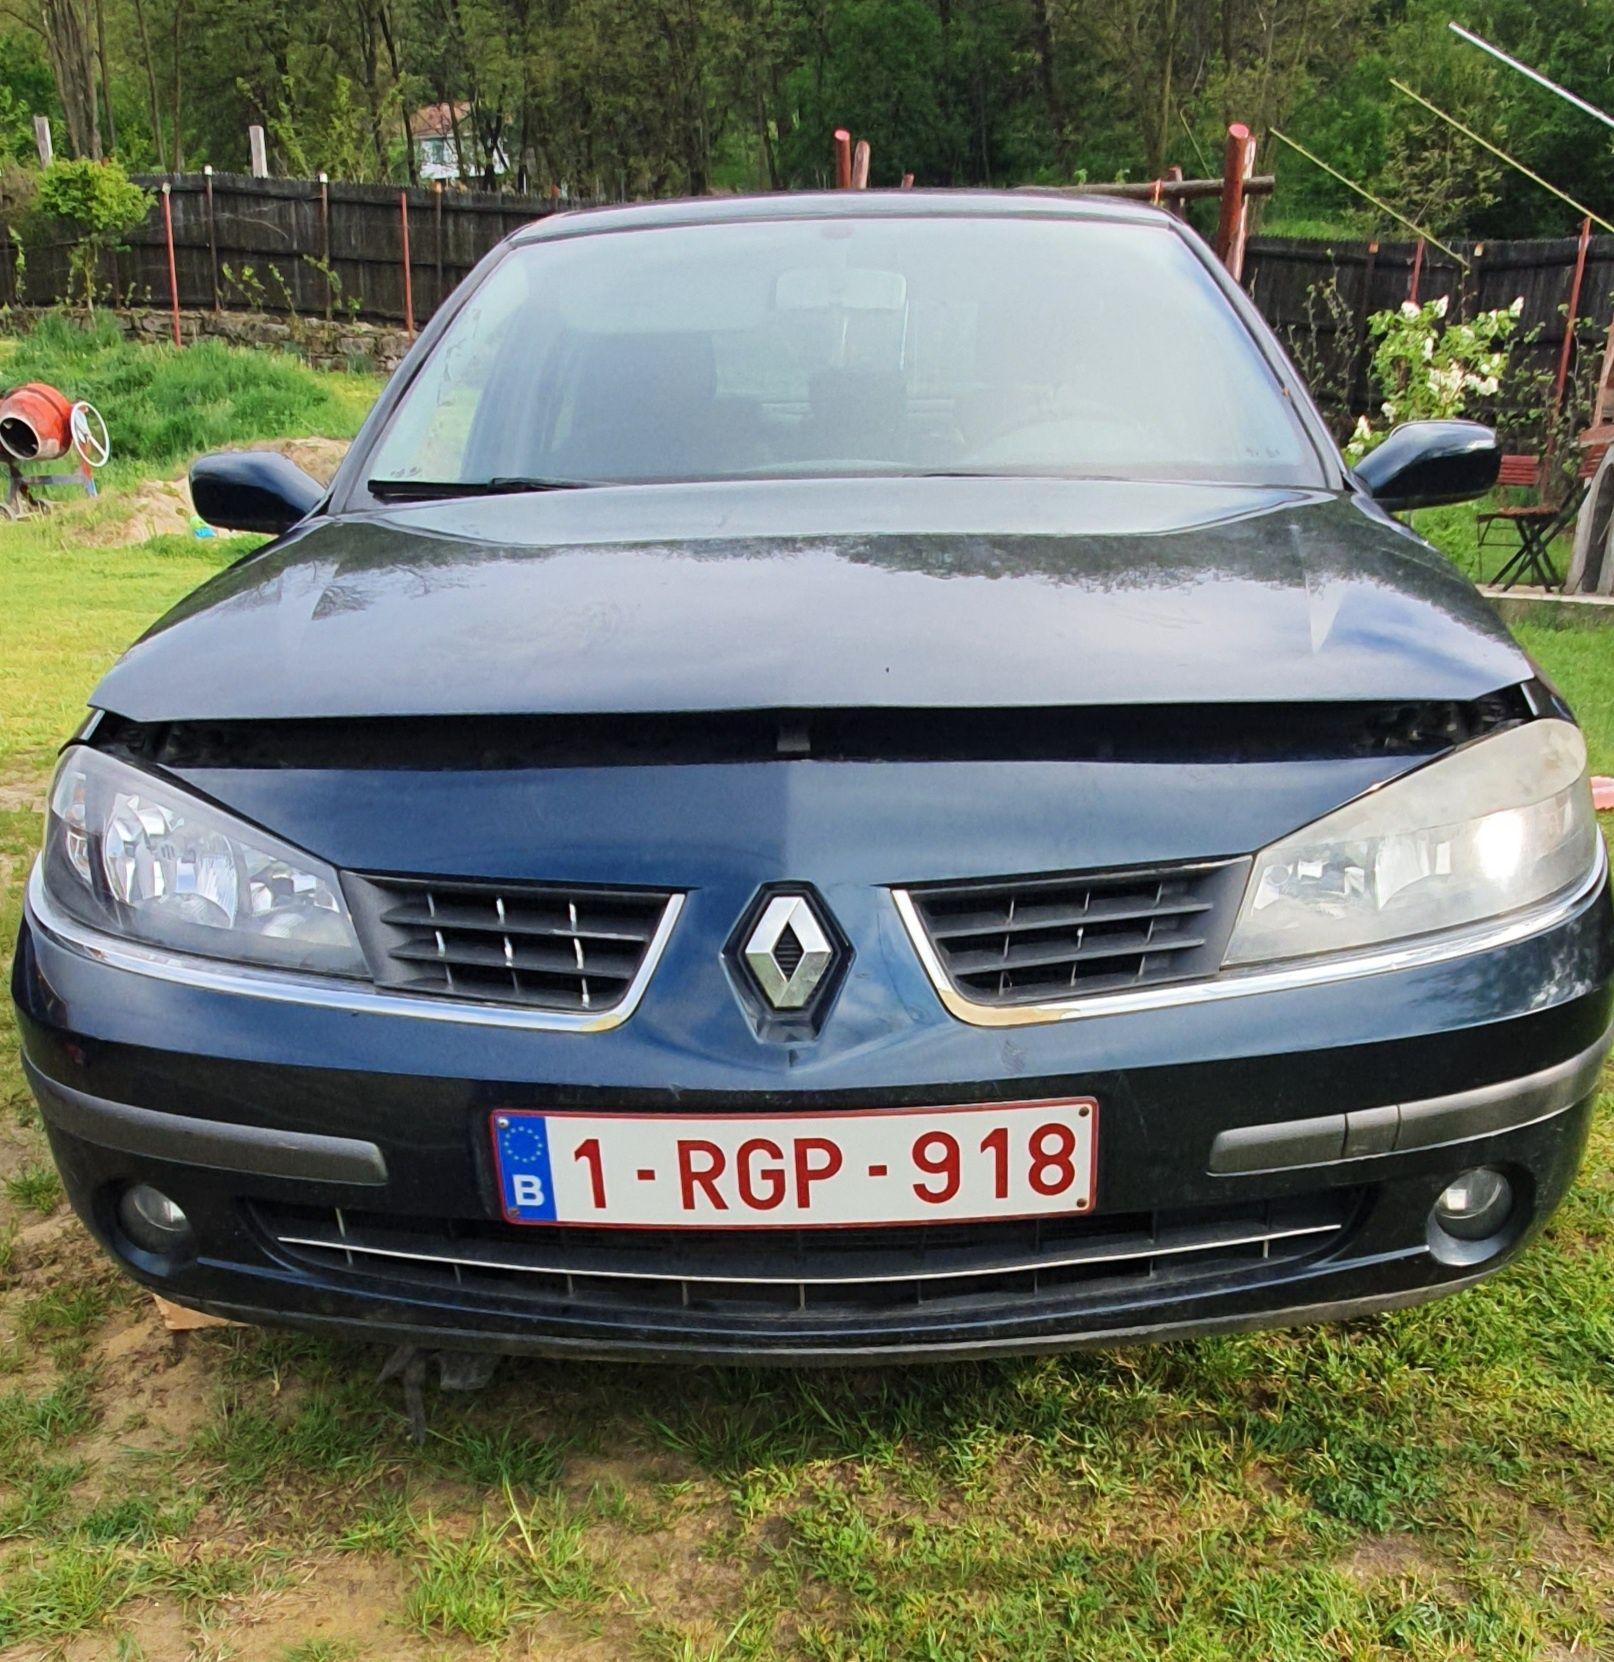 Dezmembrez Renault Laguna 2 facelift 2006 motor 1.9 dci